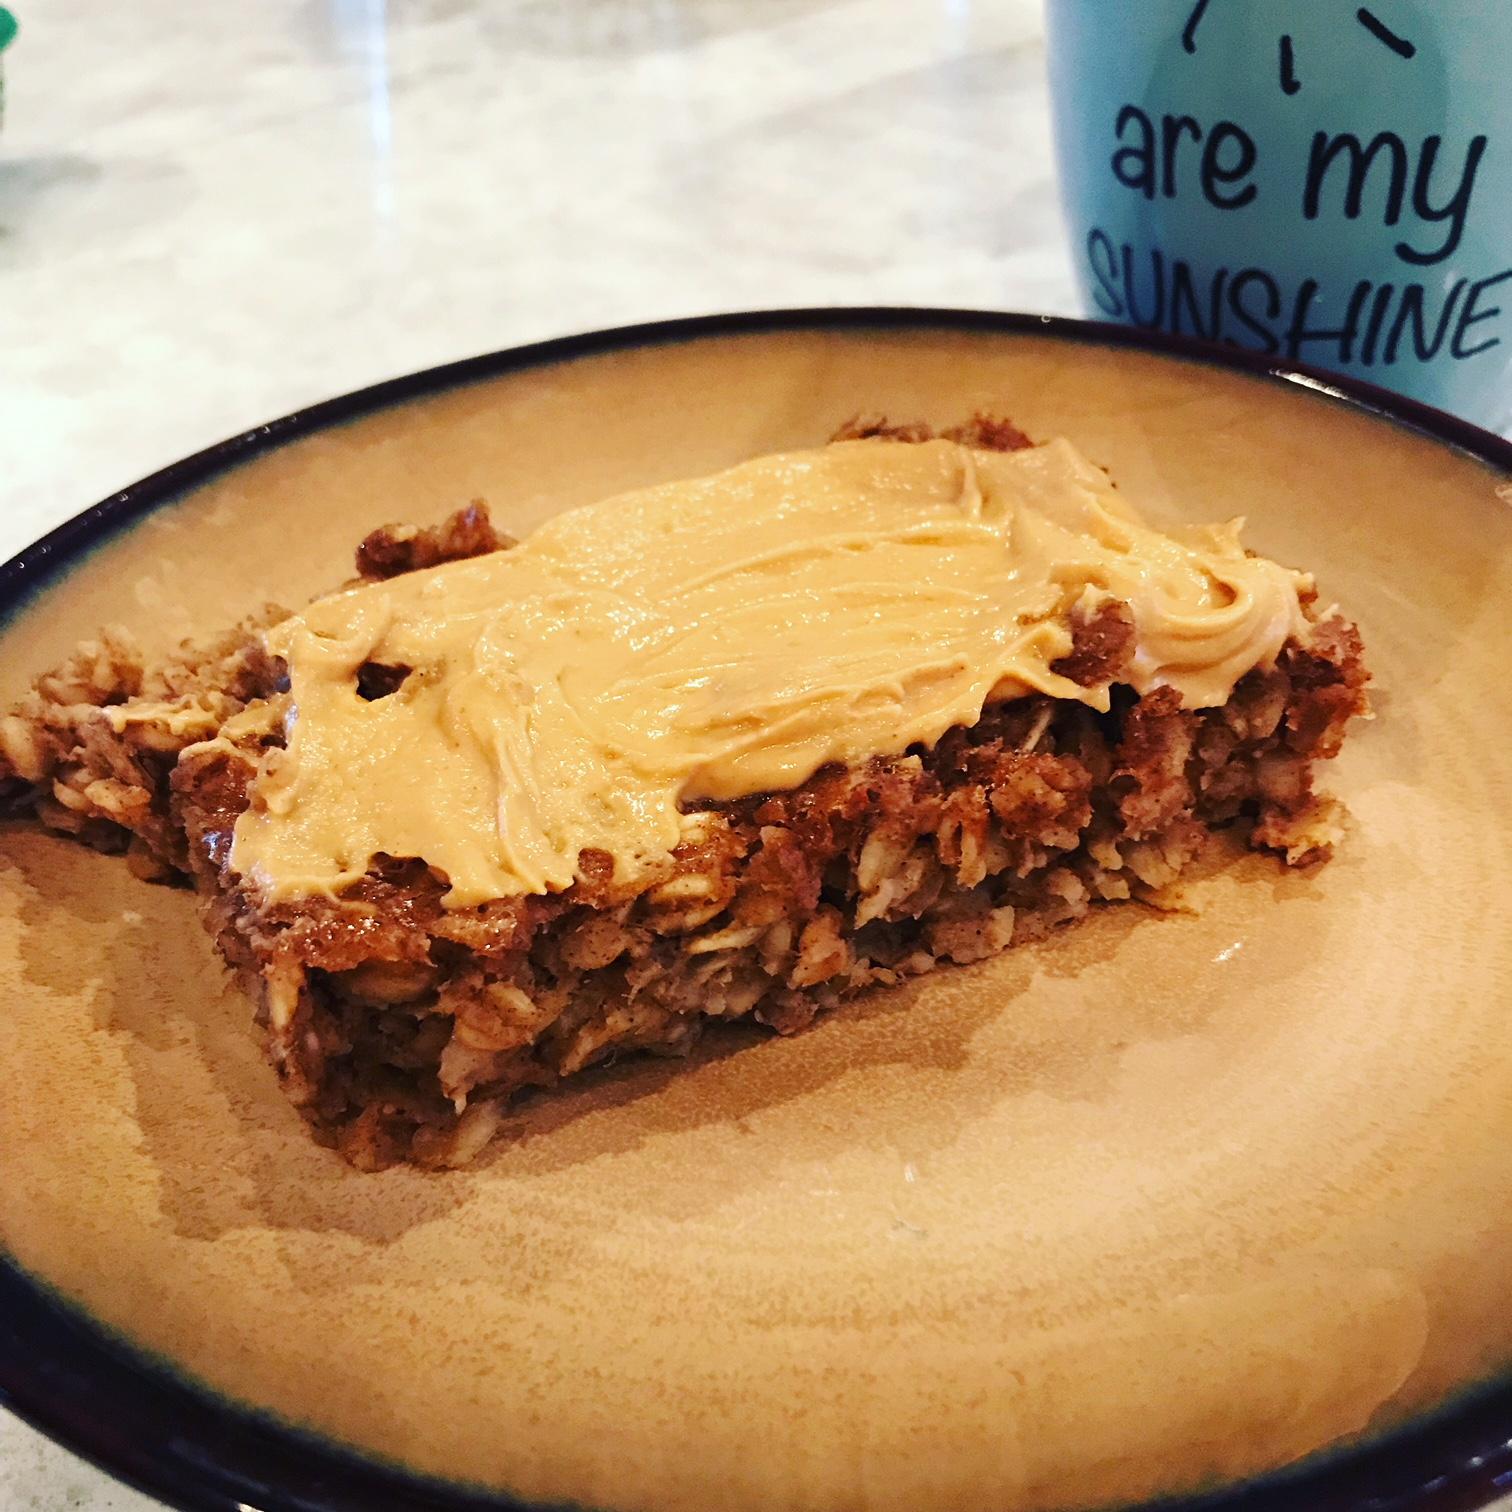 Peanut butter and banana oatmeal bake